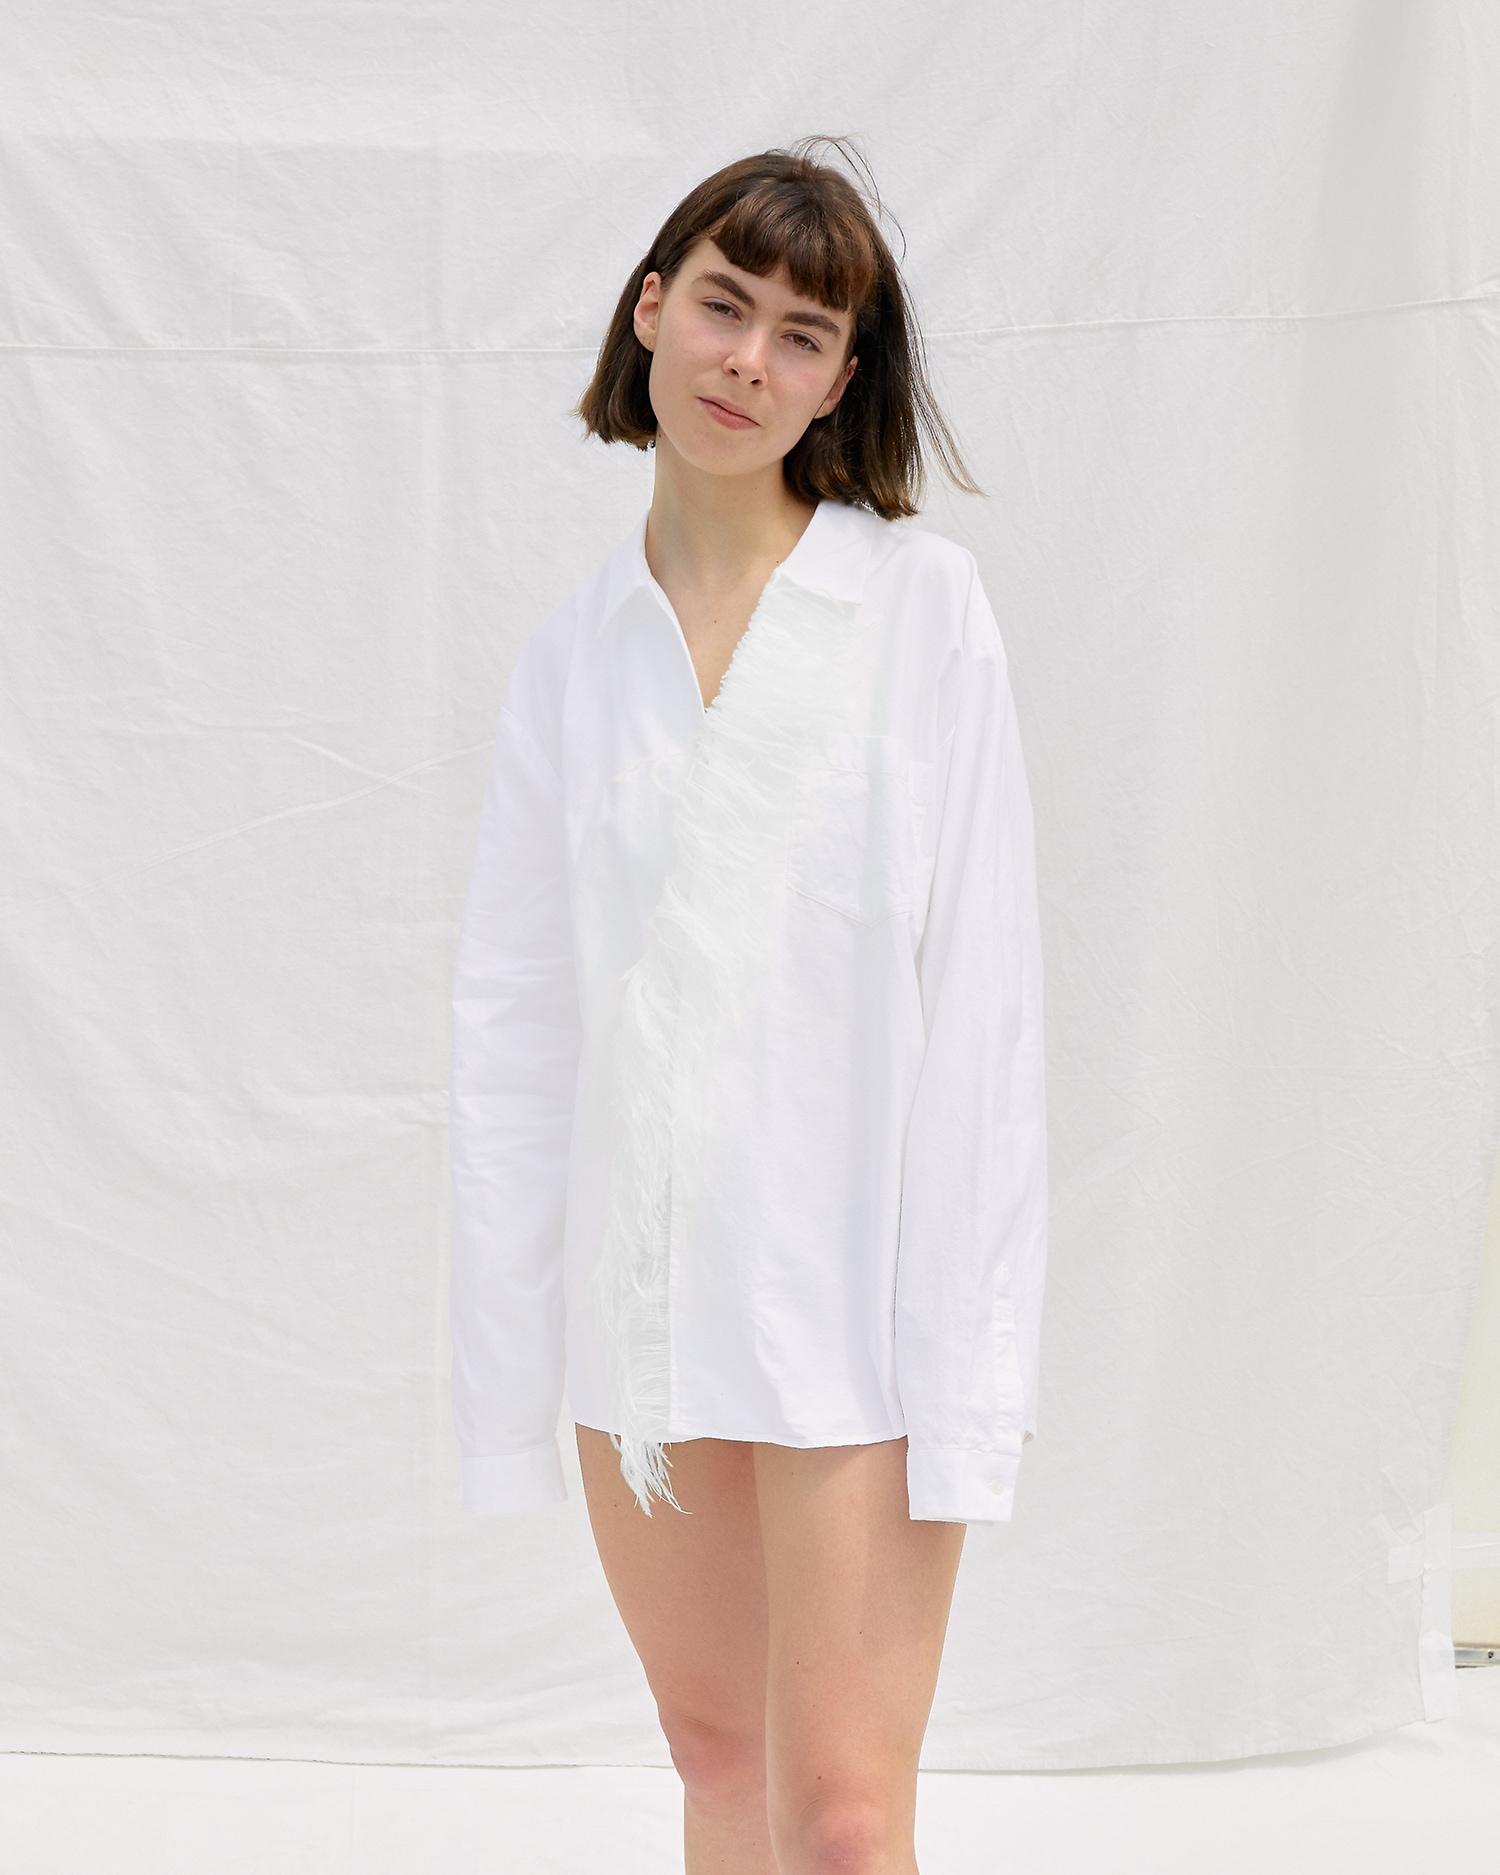 Shop Designer Dress Shirt with Feather Detail at Front. Gender Neutral.